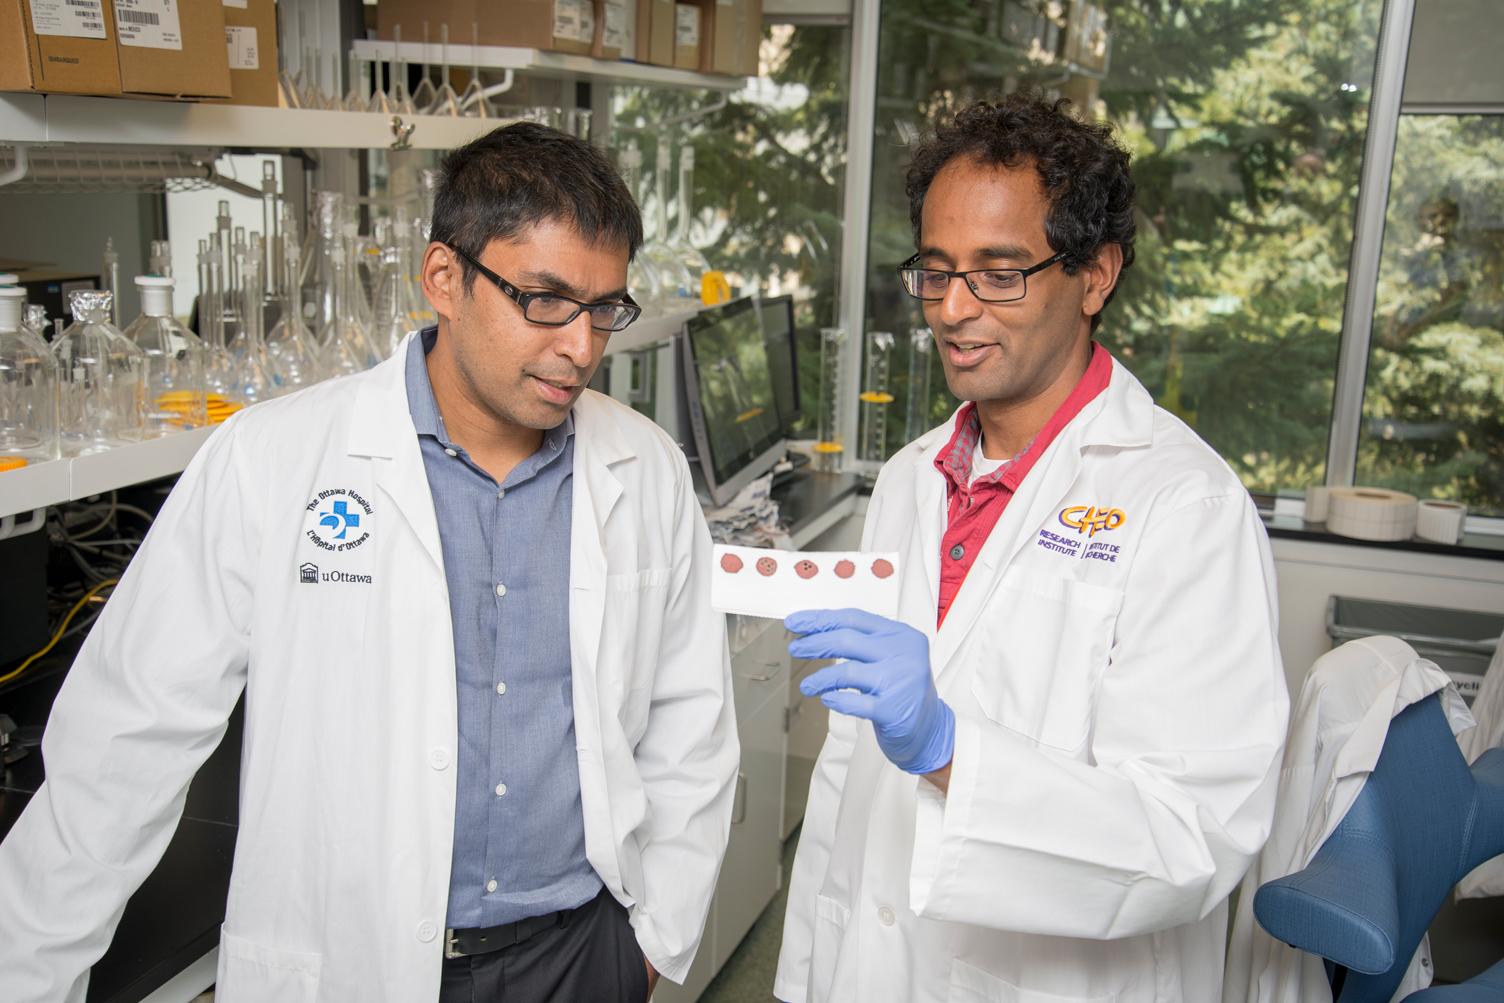 Photo des DrsKumananWilson et PraneshChakraborty examinant un échantillon de sang.